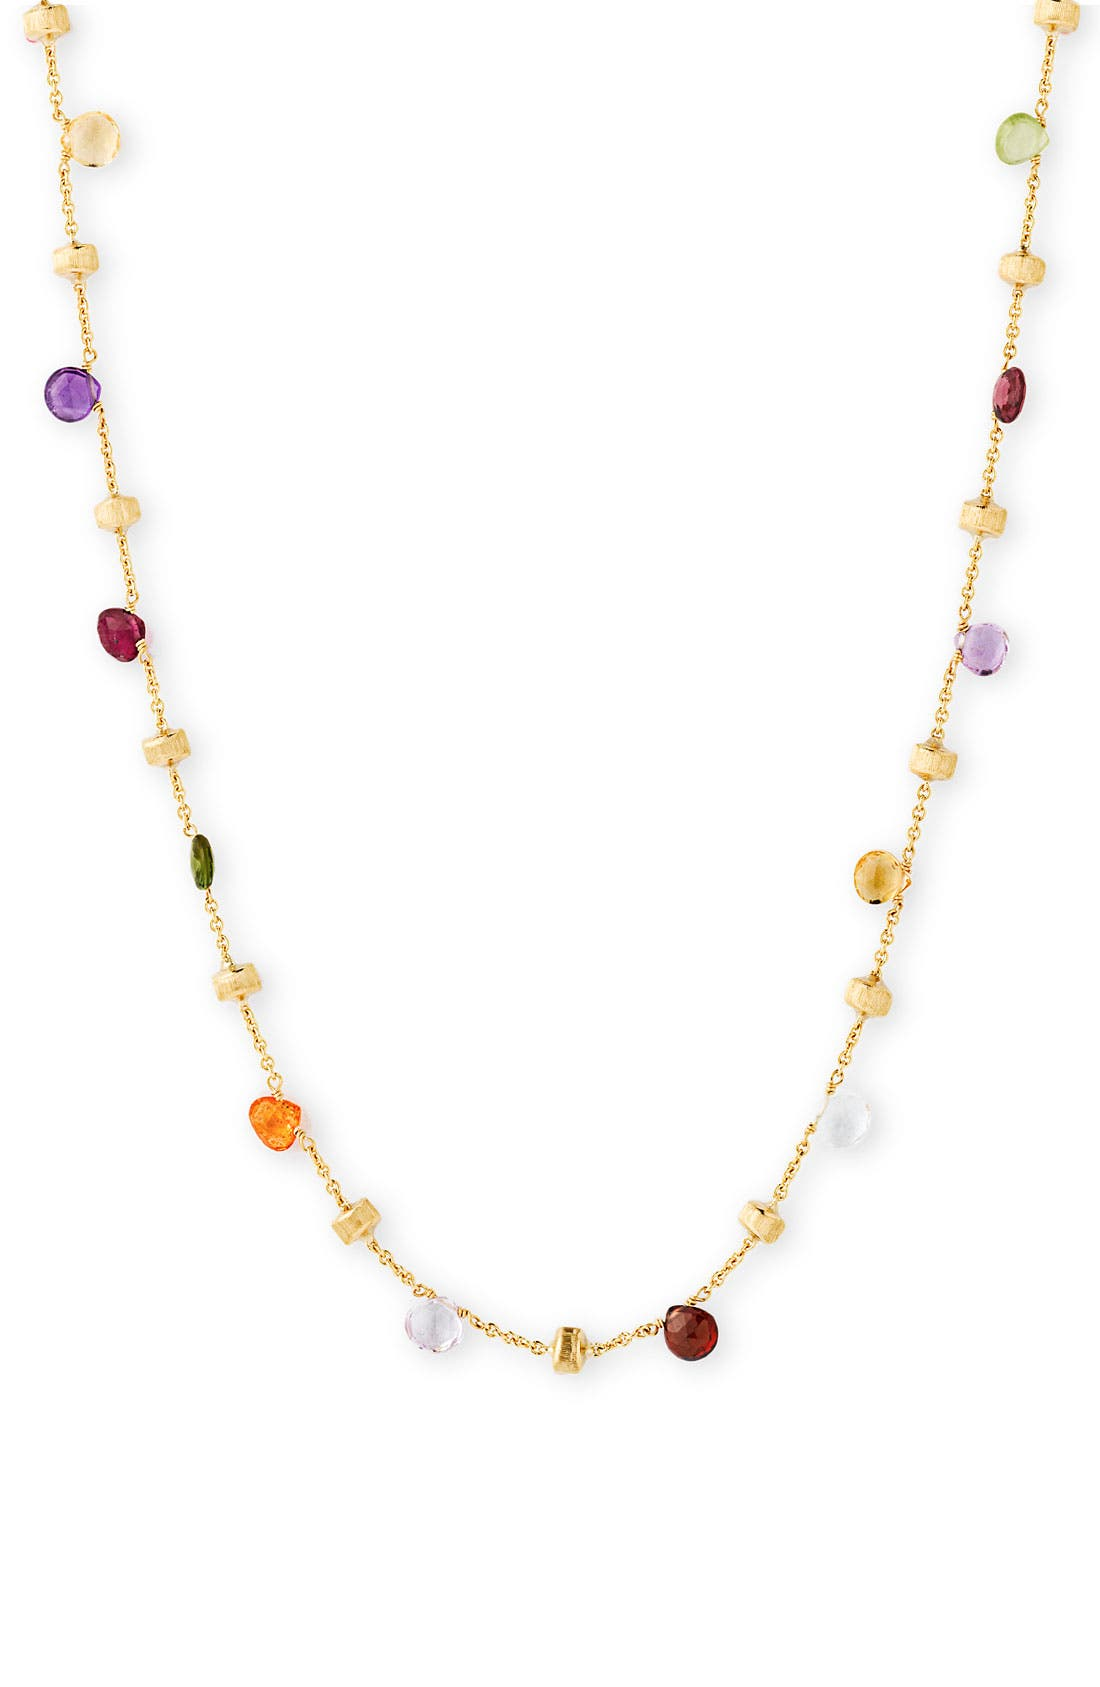 Alternate Image 1 Selected - Marco Bicego 'Paradise' Single Strand Semiprecious Necklace